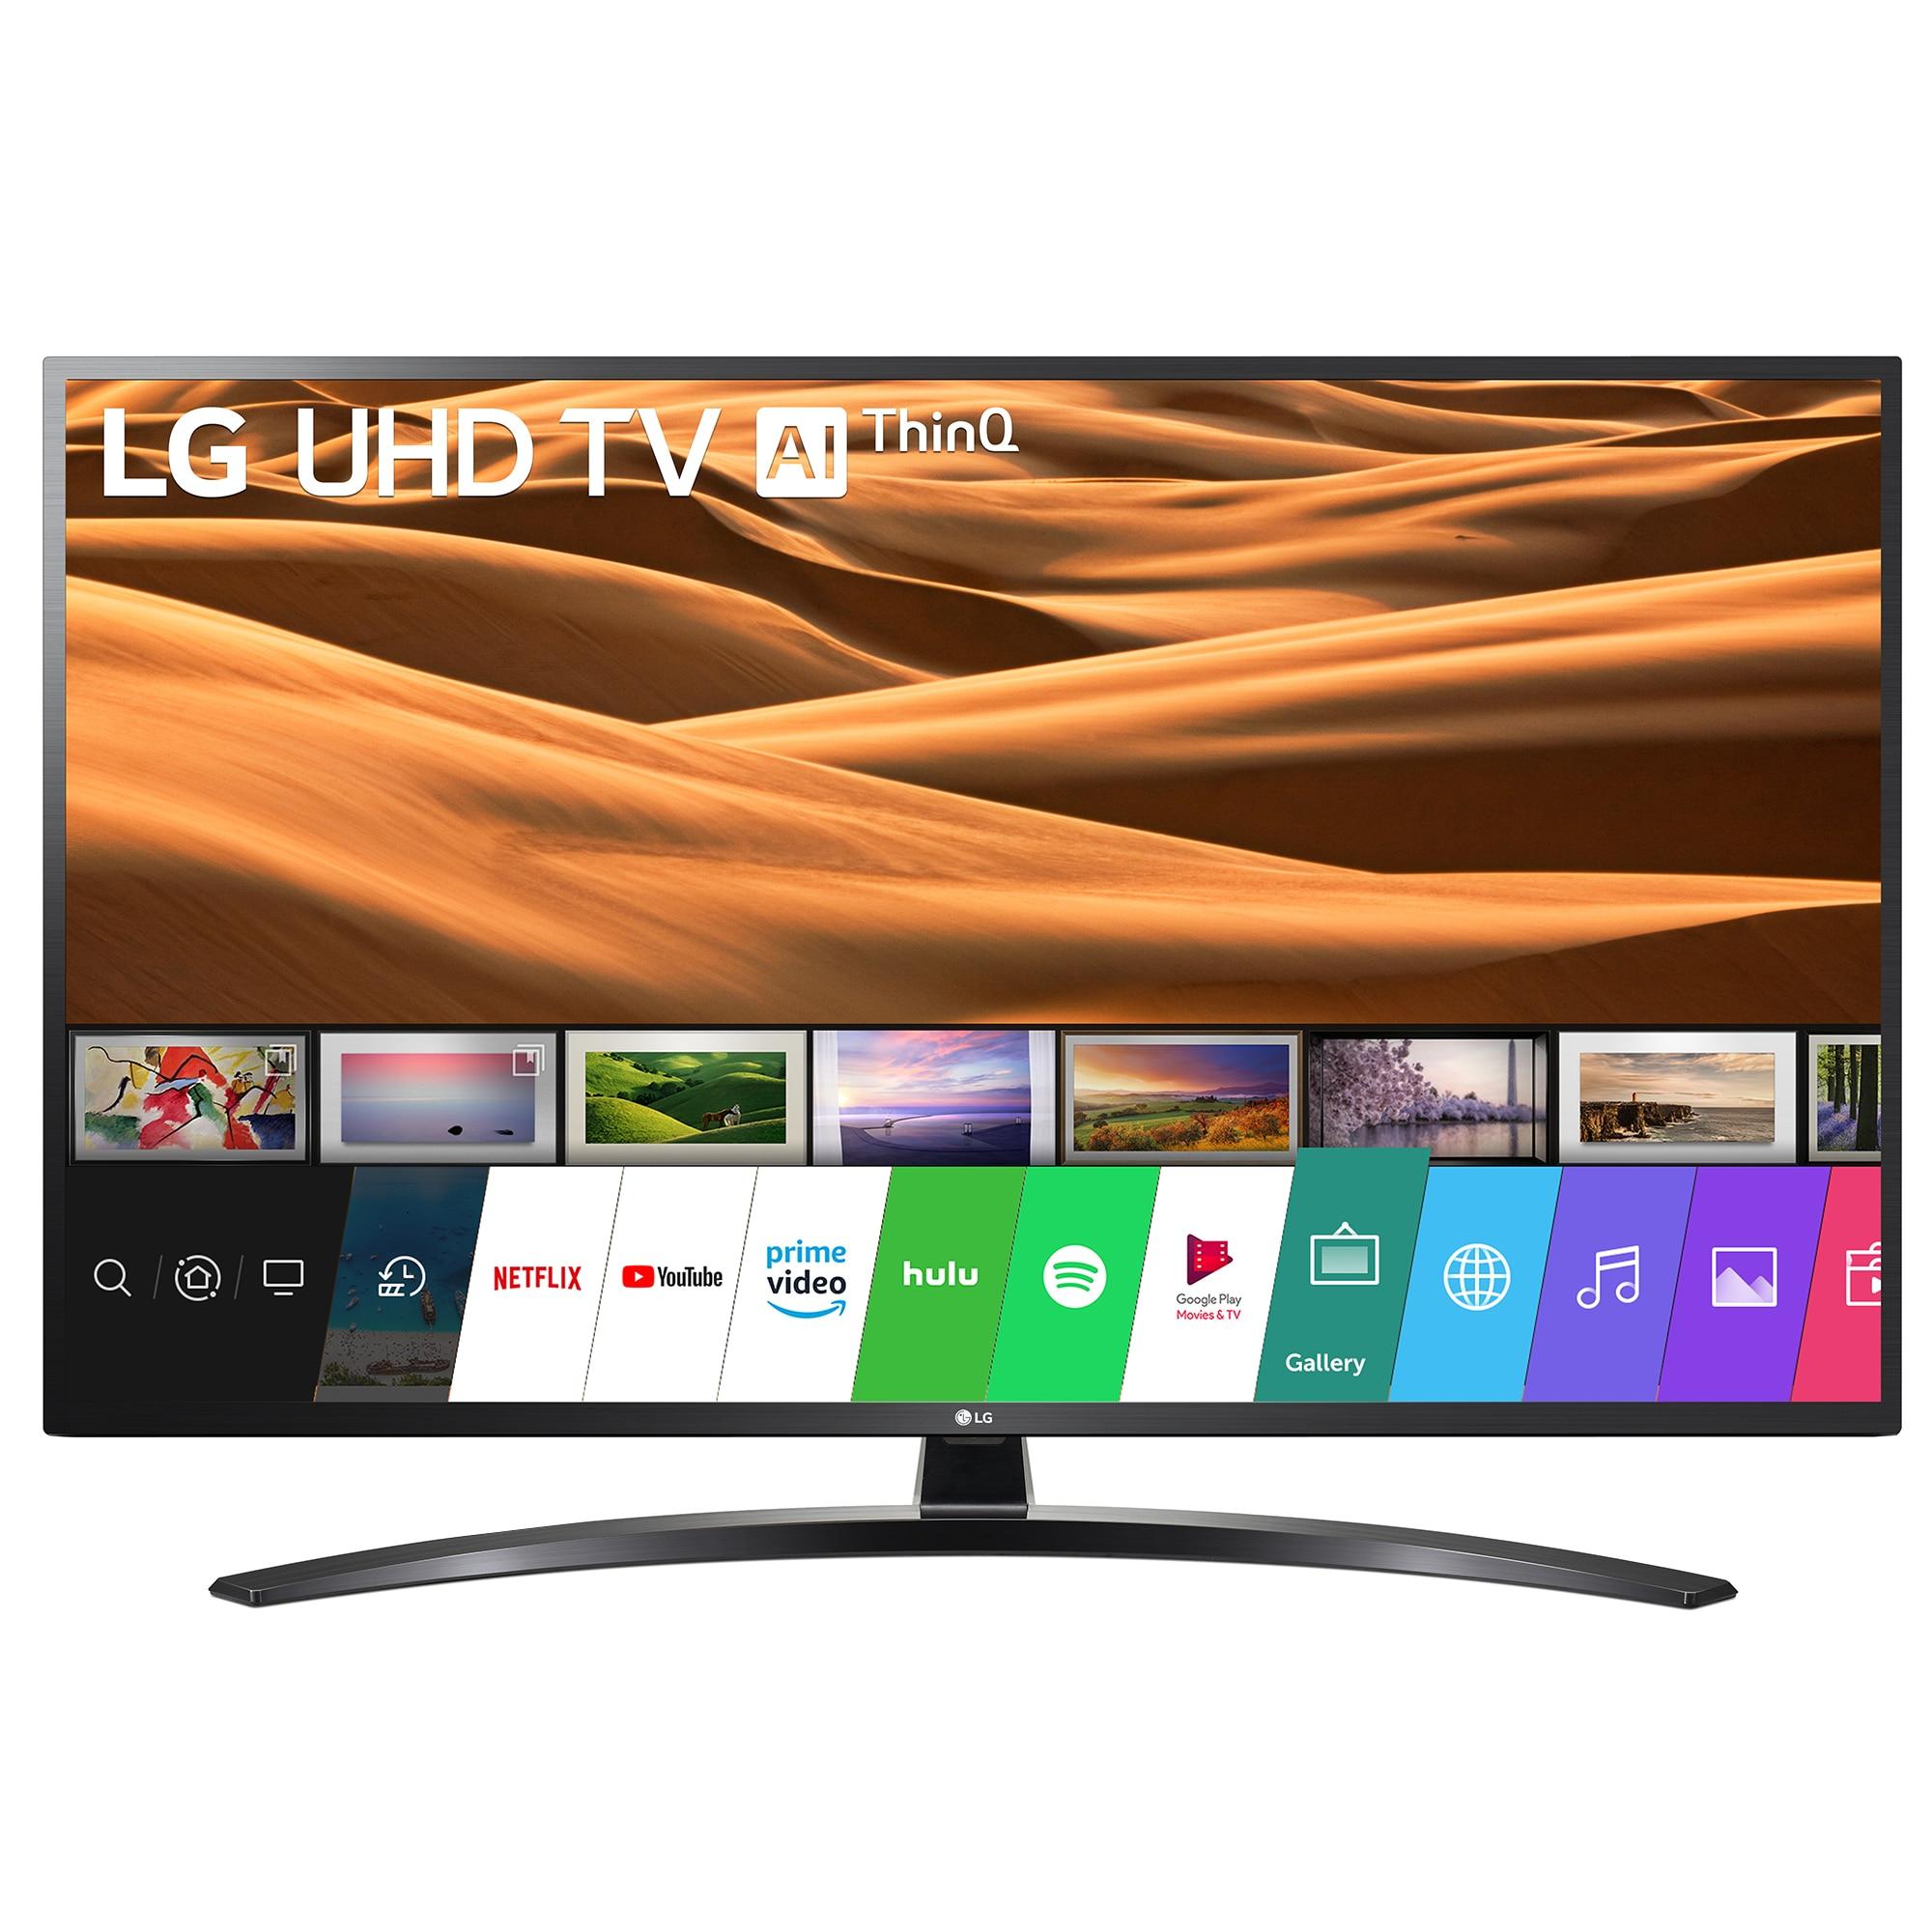 Fotografie Televizor LED Smart LG, 139 cm, 55UM7450PLA, 4K Ultra HD